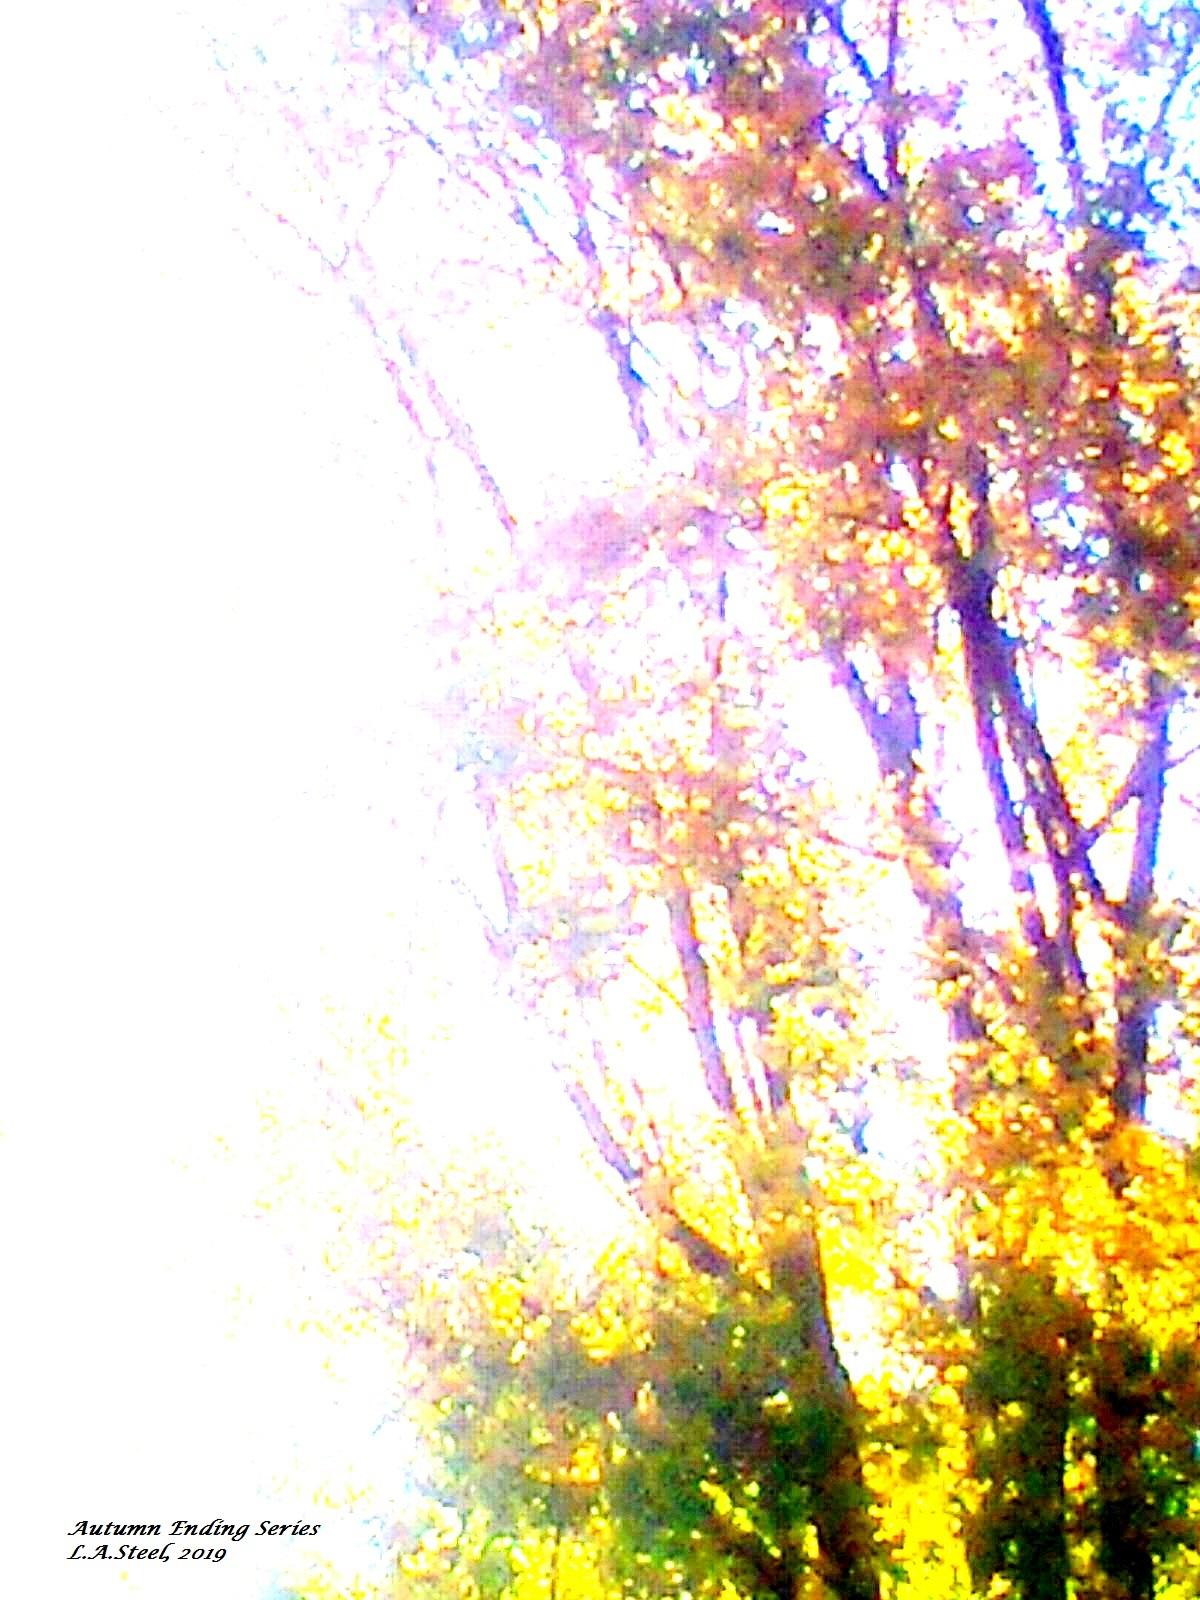 autumn ending 2019 7